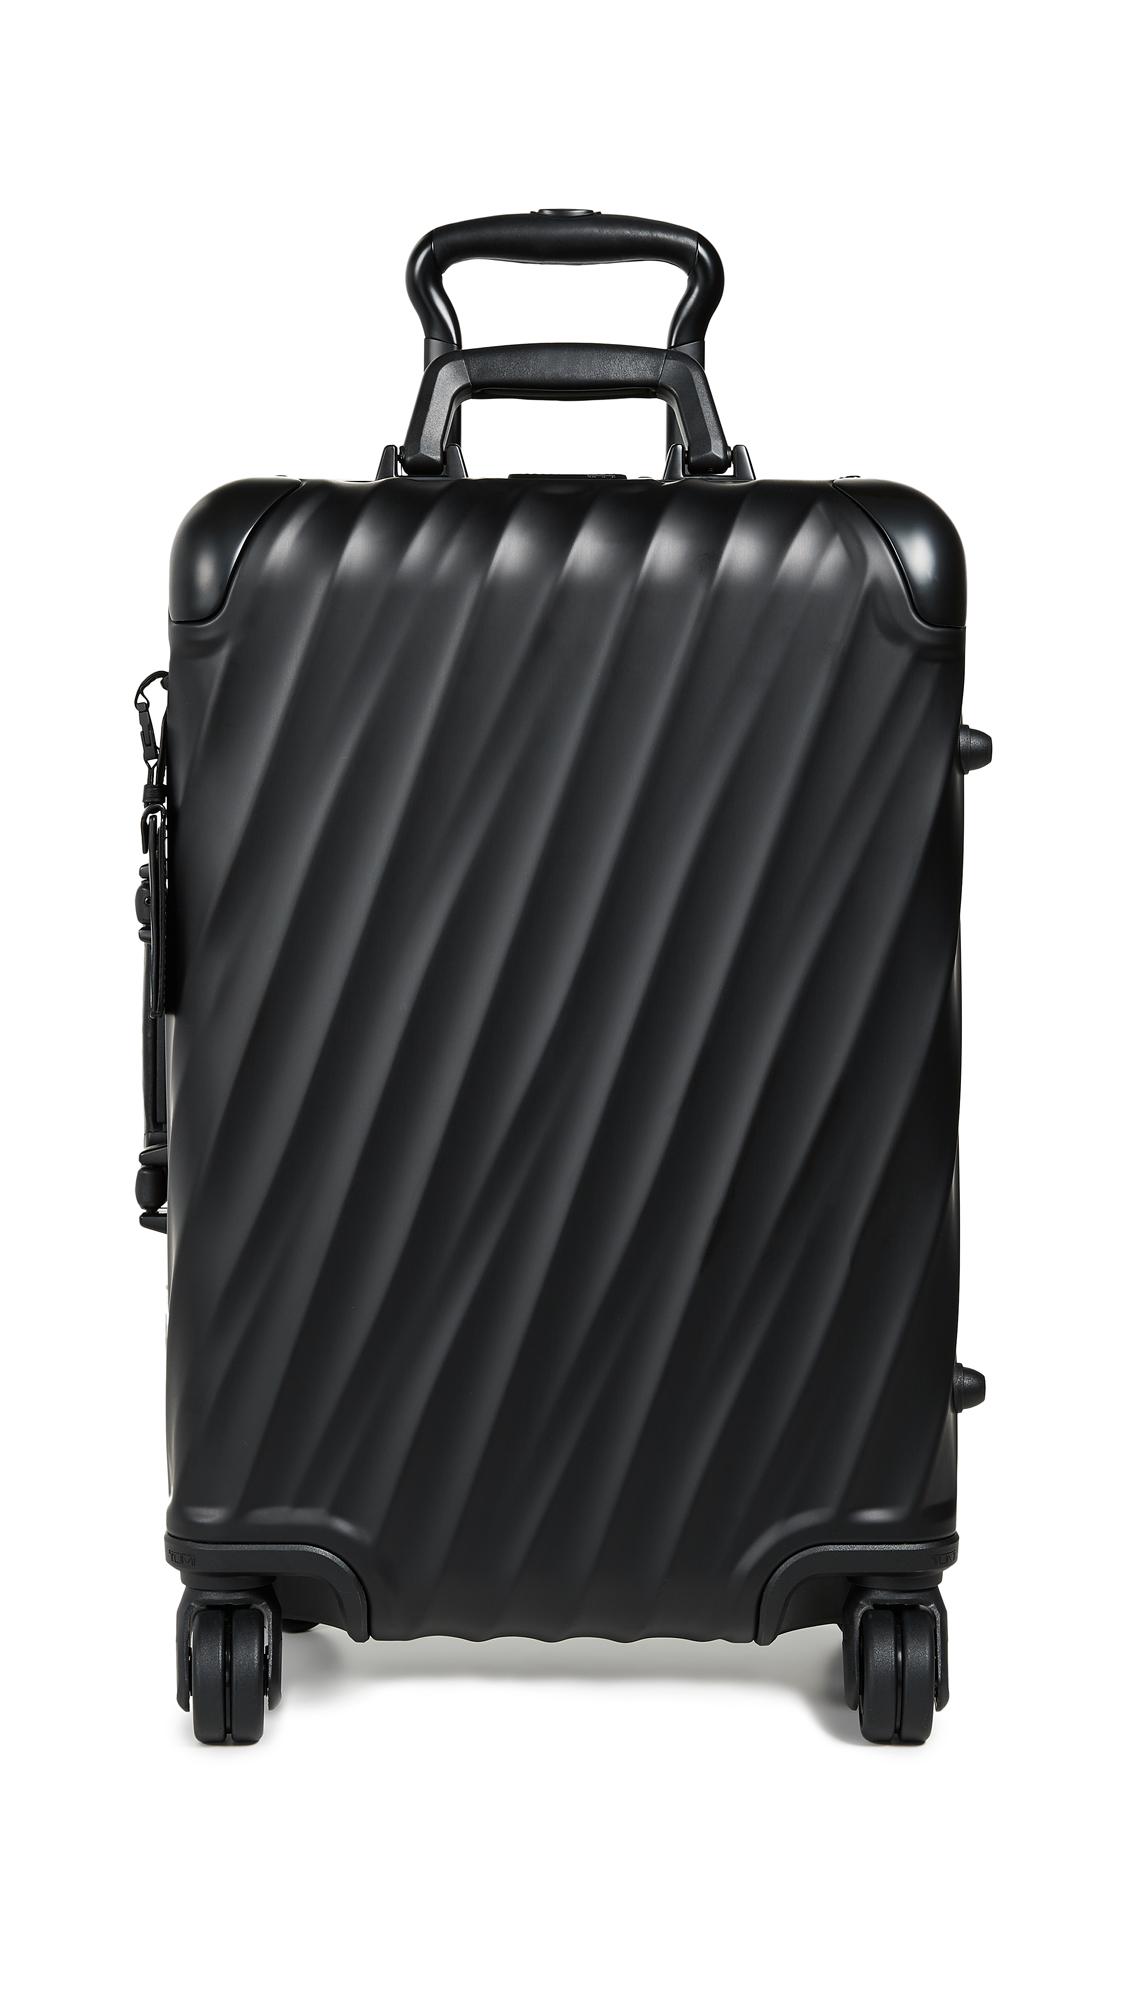 19 Degree Aluminium International Carry On Suitcase, Black Matte